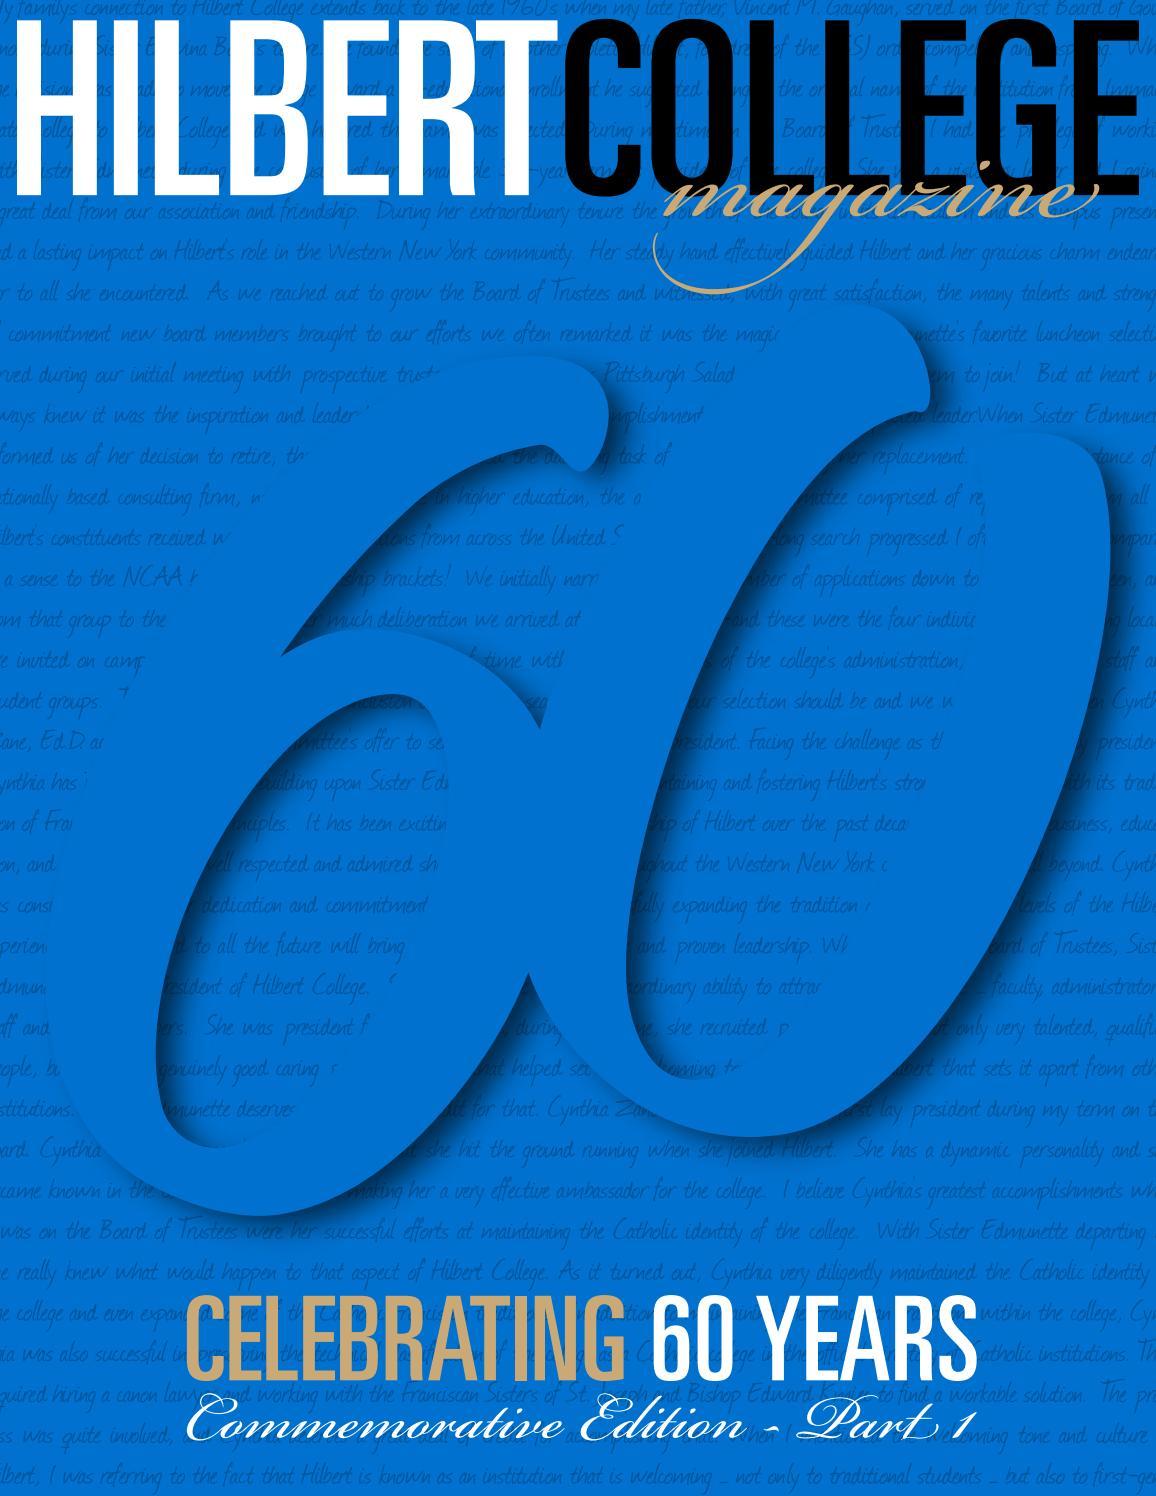 Hilbert college magazine commemorative edition part 1 by hilbert hilbert college magazine commemorative edition part 1 by hilbert college issuu malvernweather Image collections